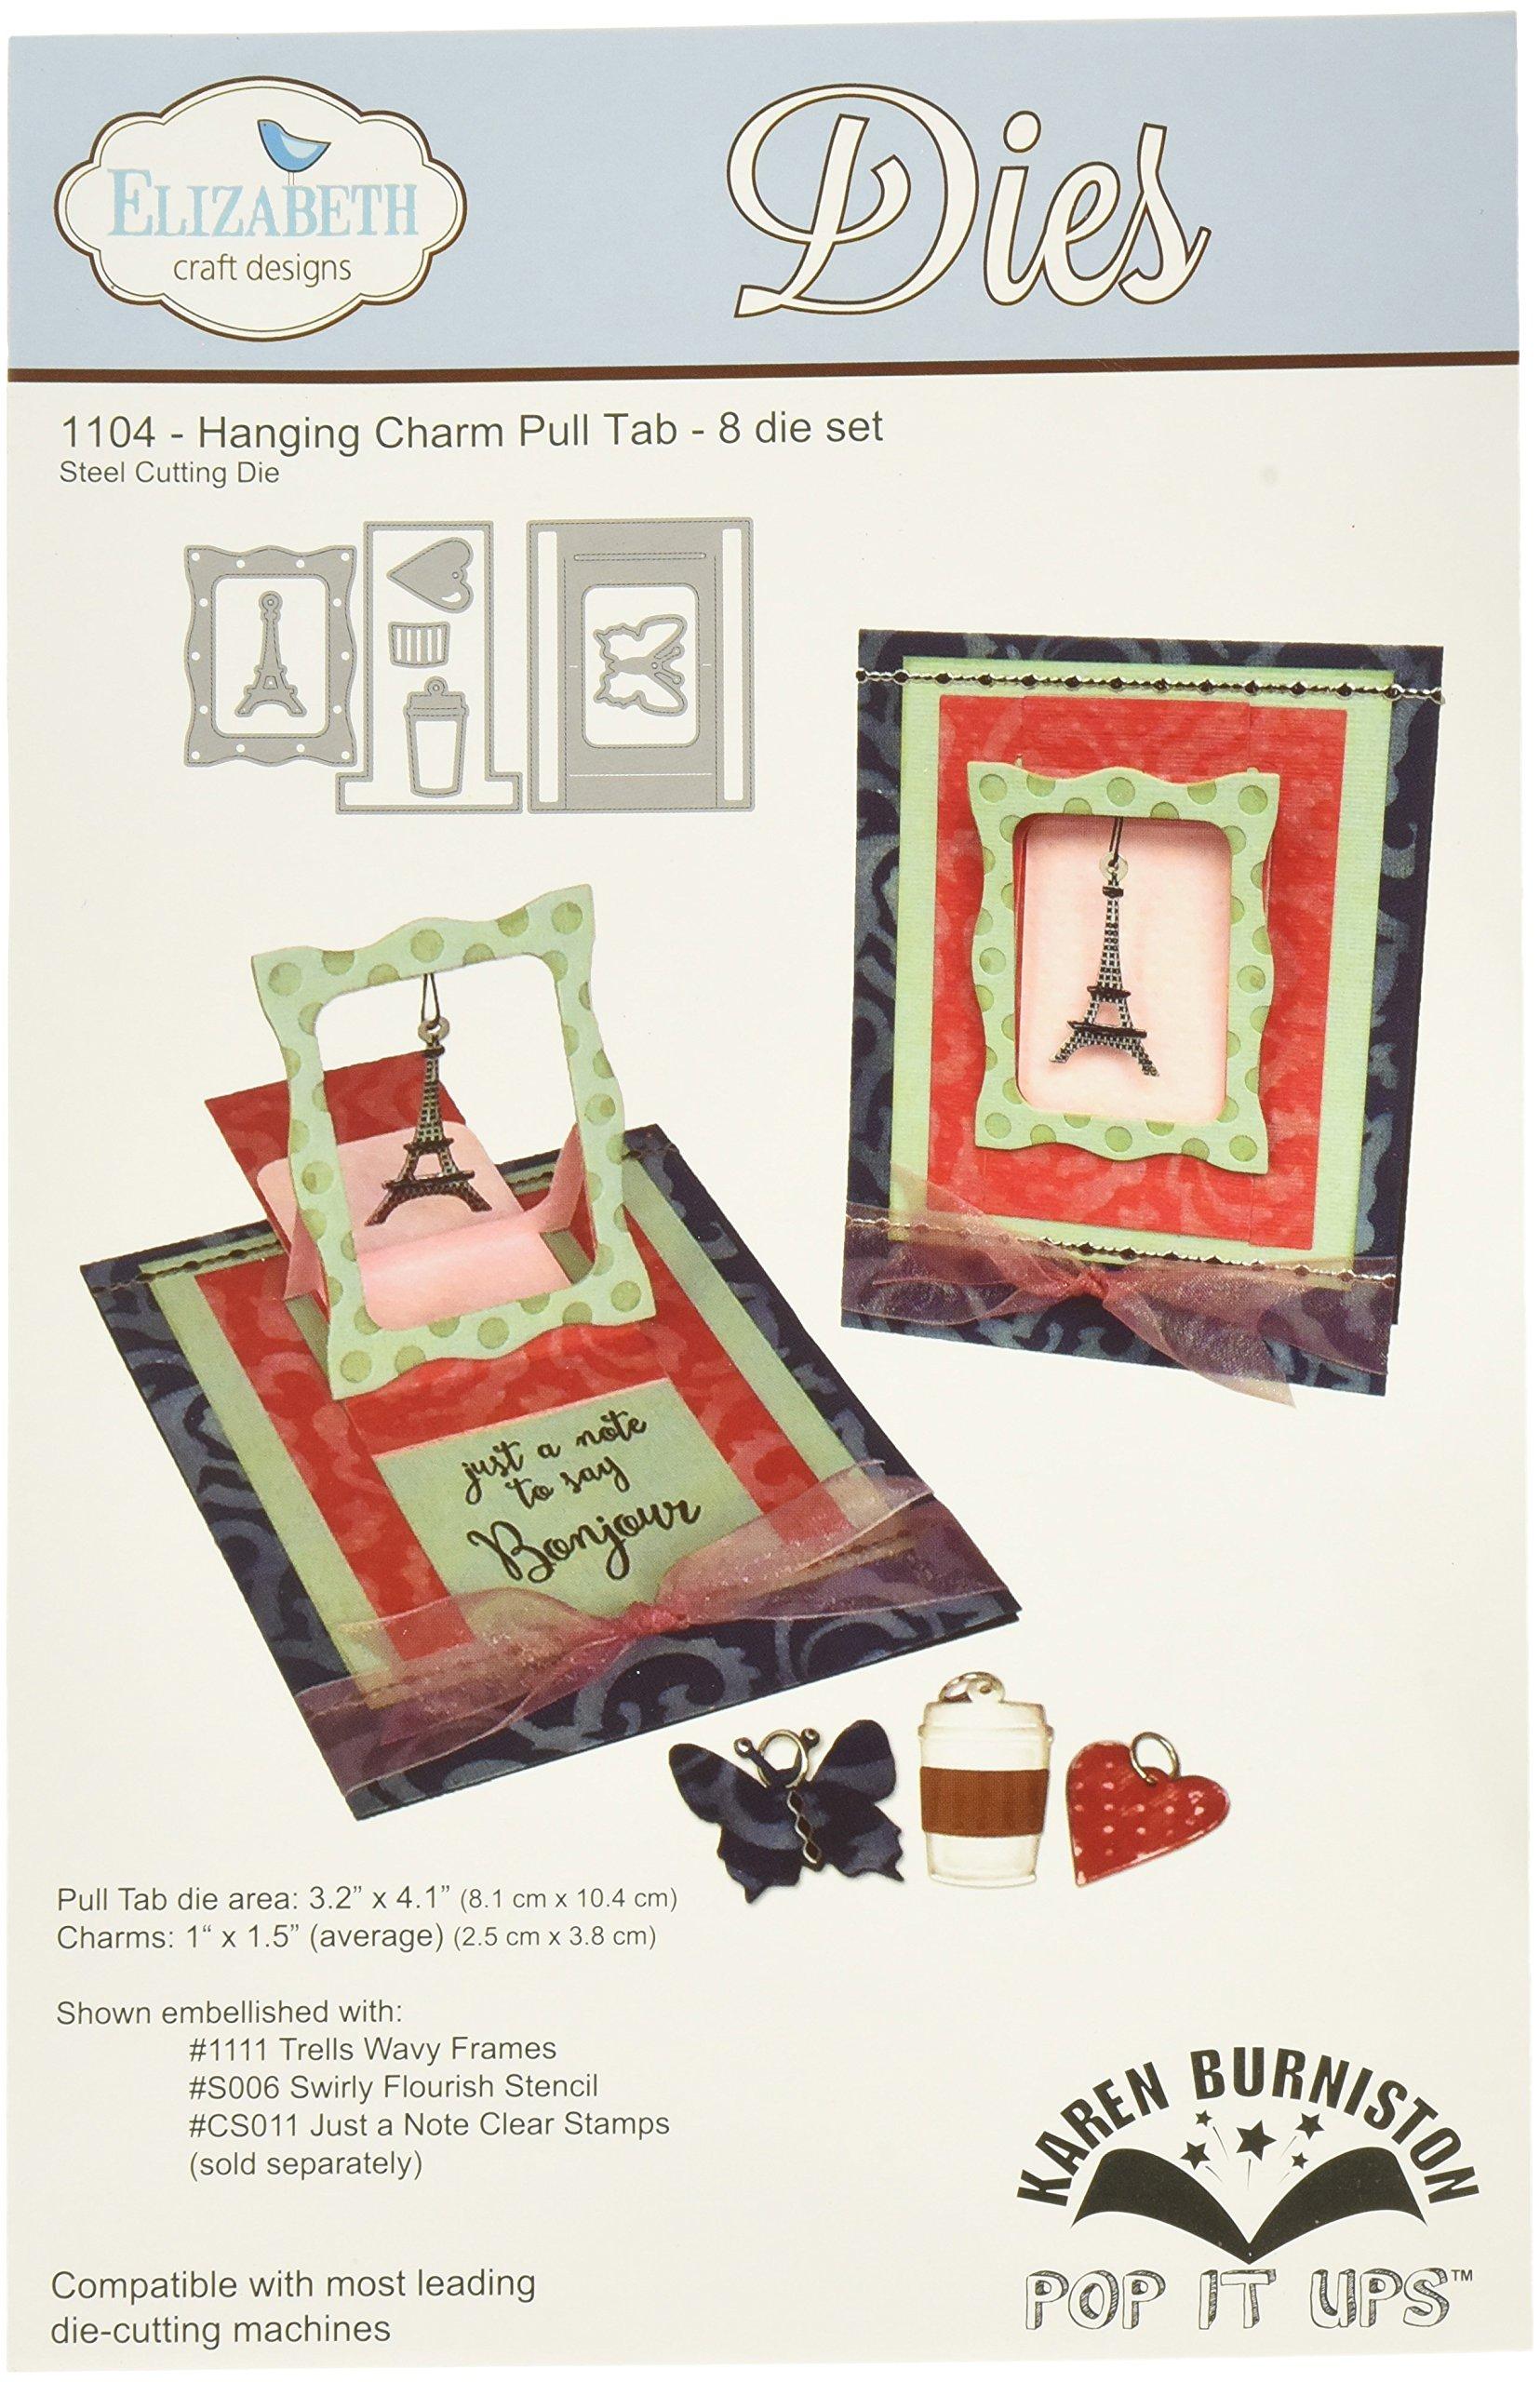 Elizabeth Craft Designs 1104 Karen Burniston Hanging Charm Pull Tab Pop It Up Metal Dies